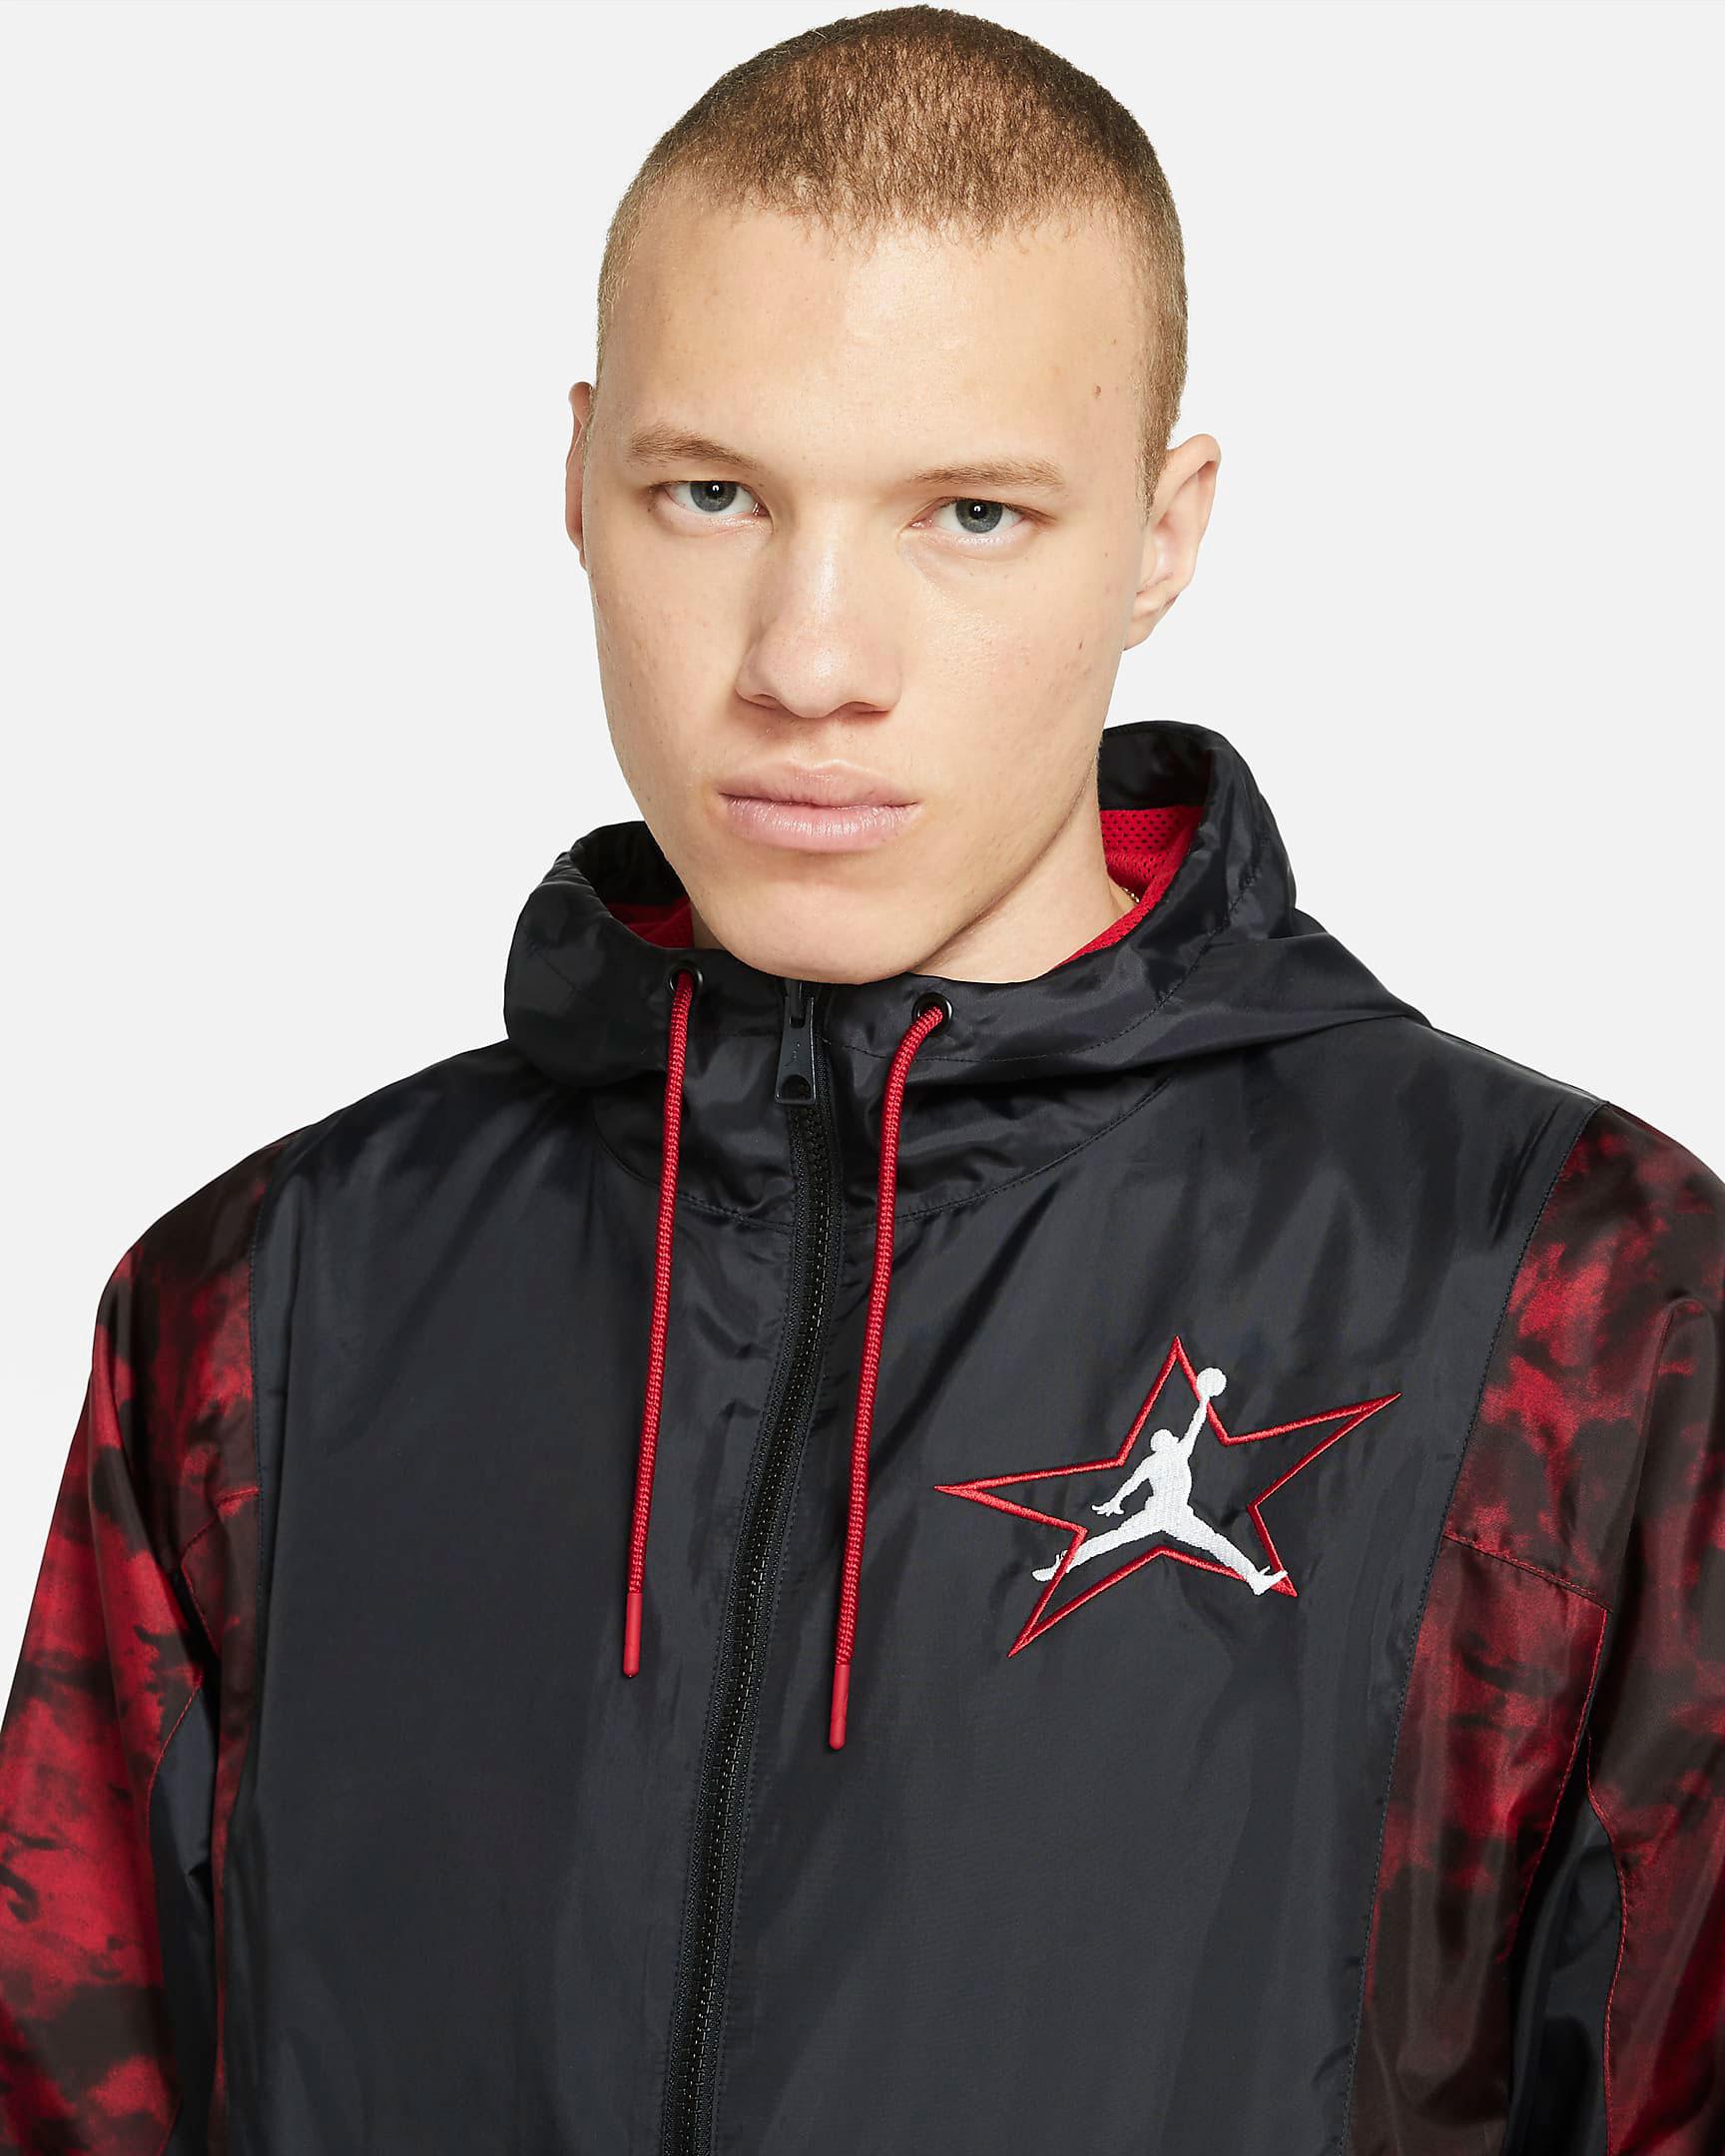 carmine-jordan-6-jacket-3